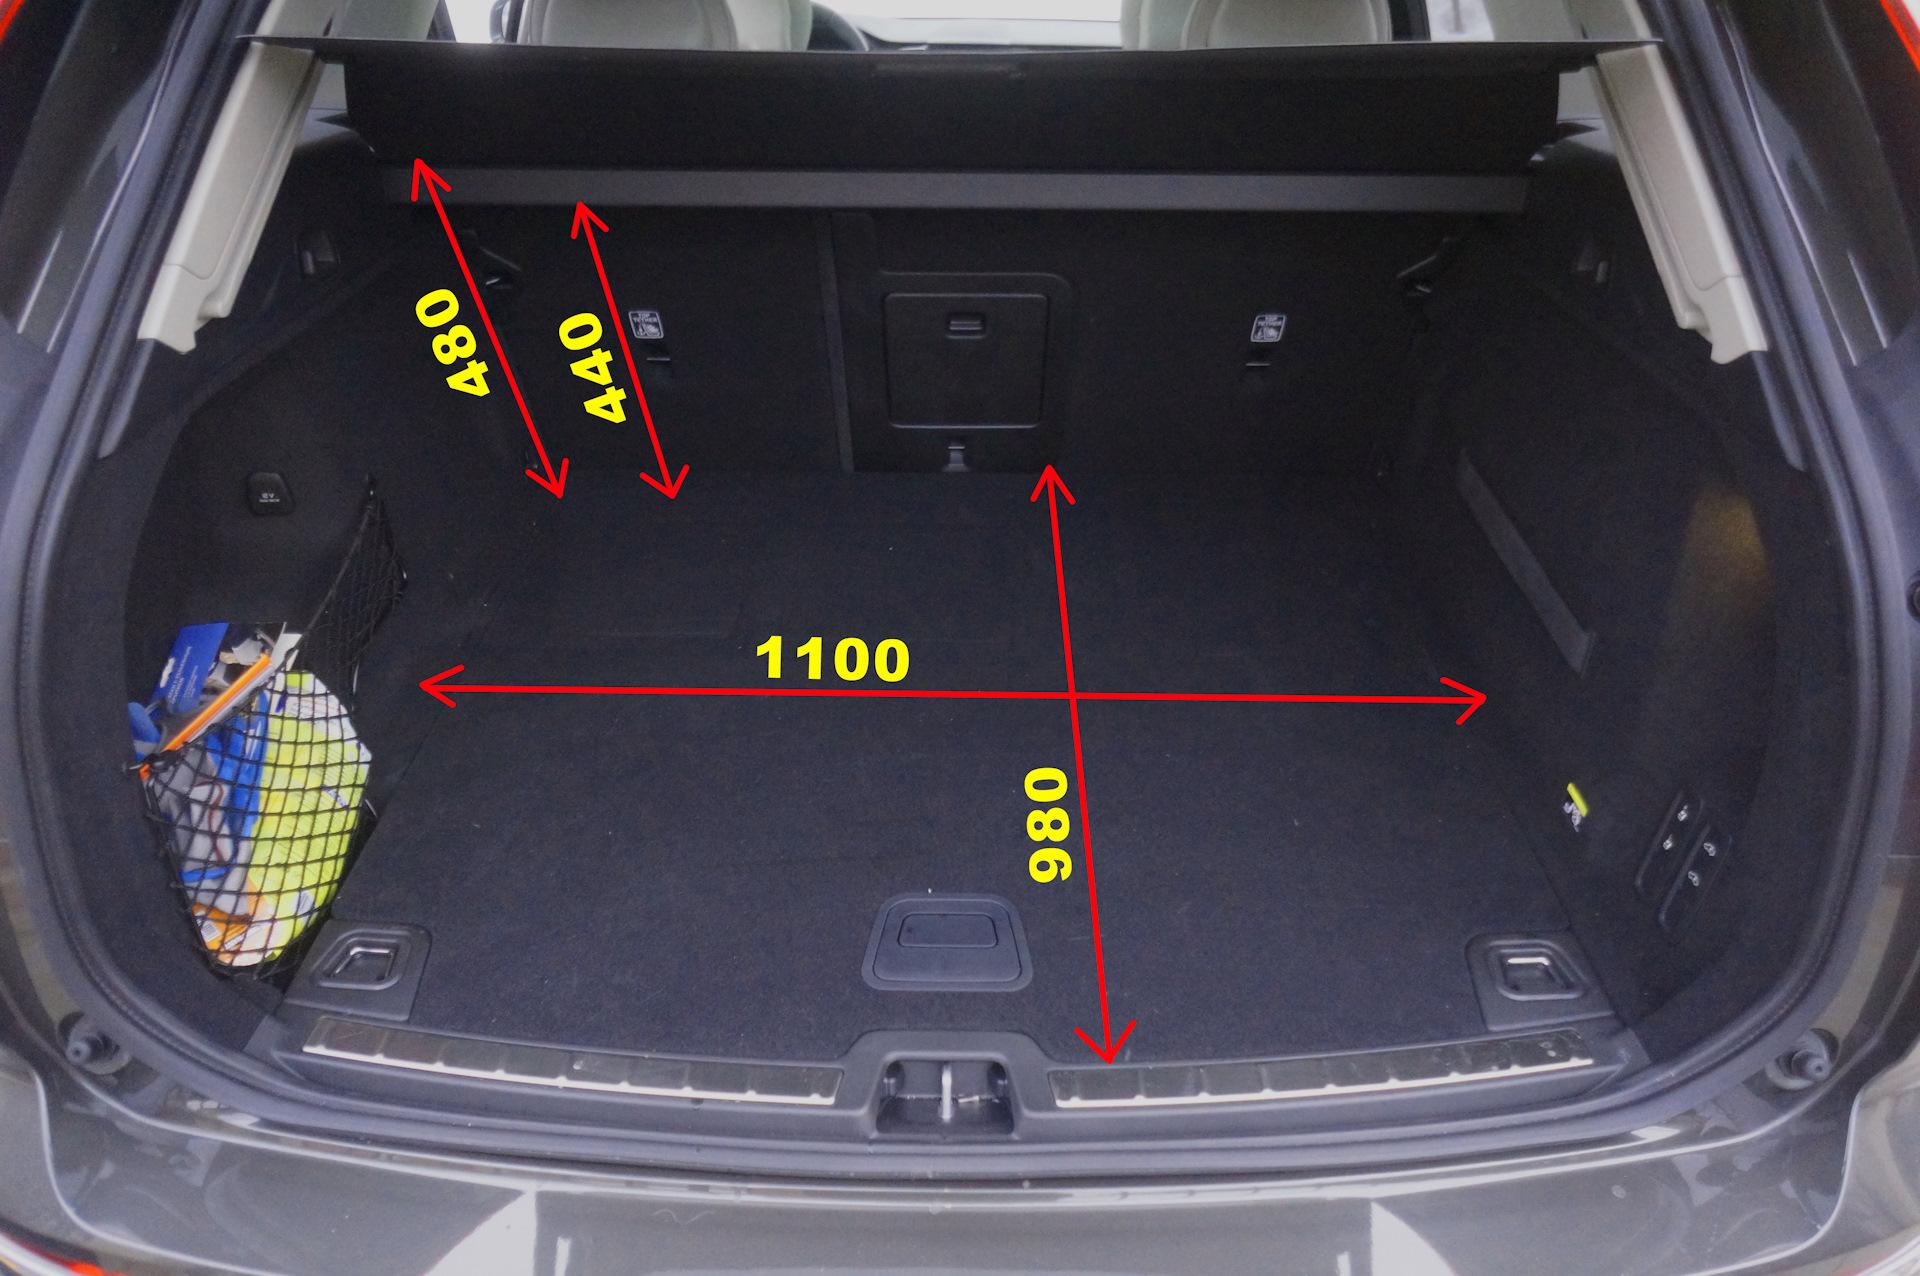 Покраска багажника вольво хс70 Замена заднего амортизатора fx35